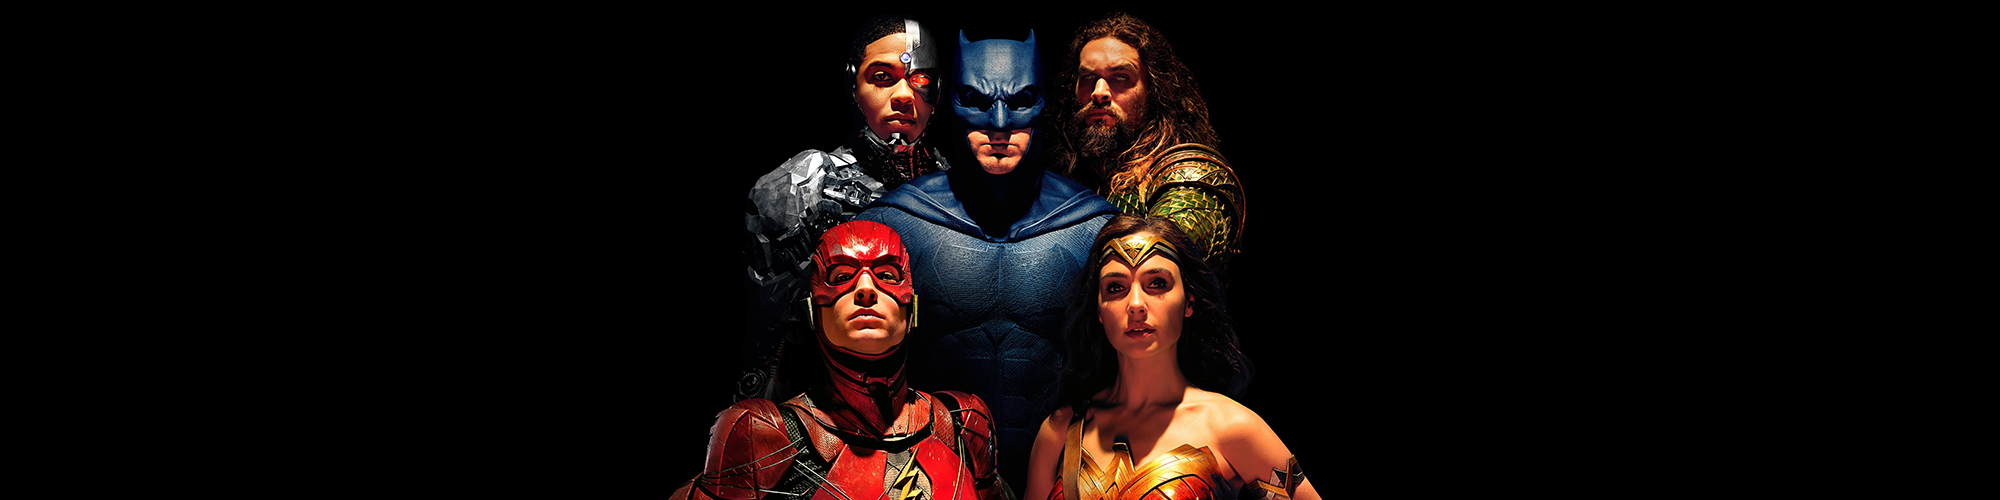 La BO de Justice League est signée Danny Elfman